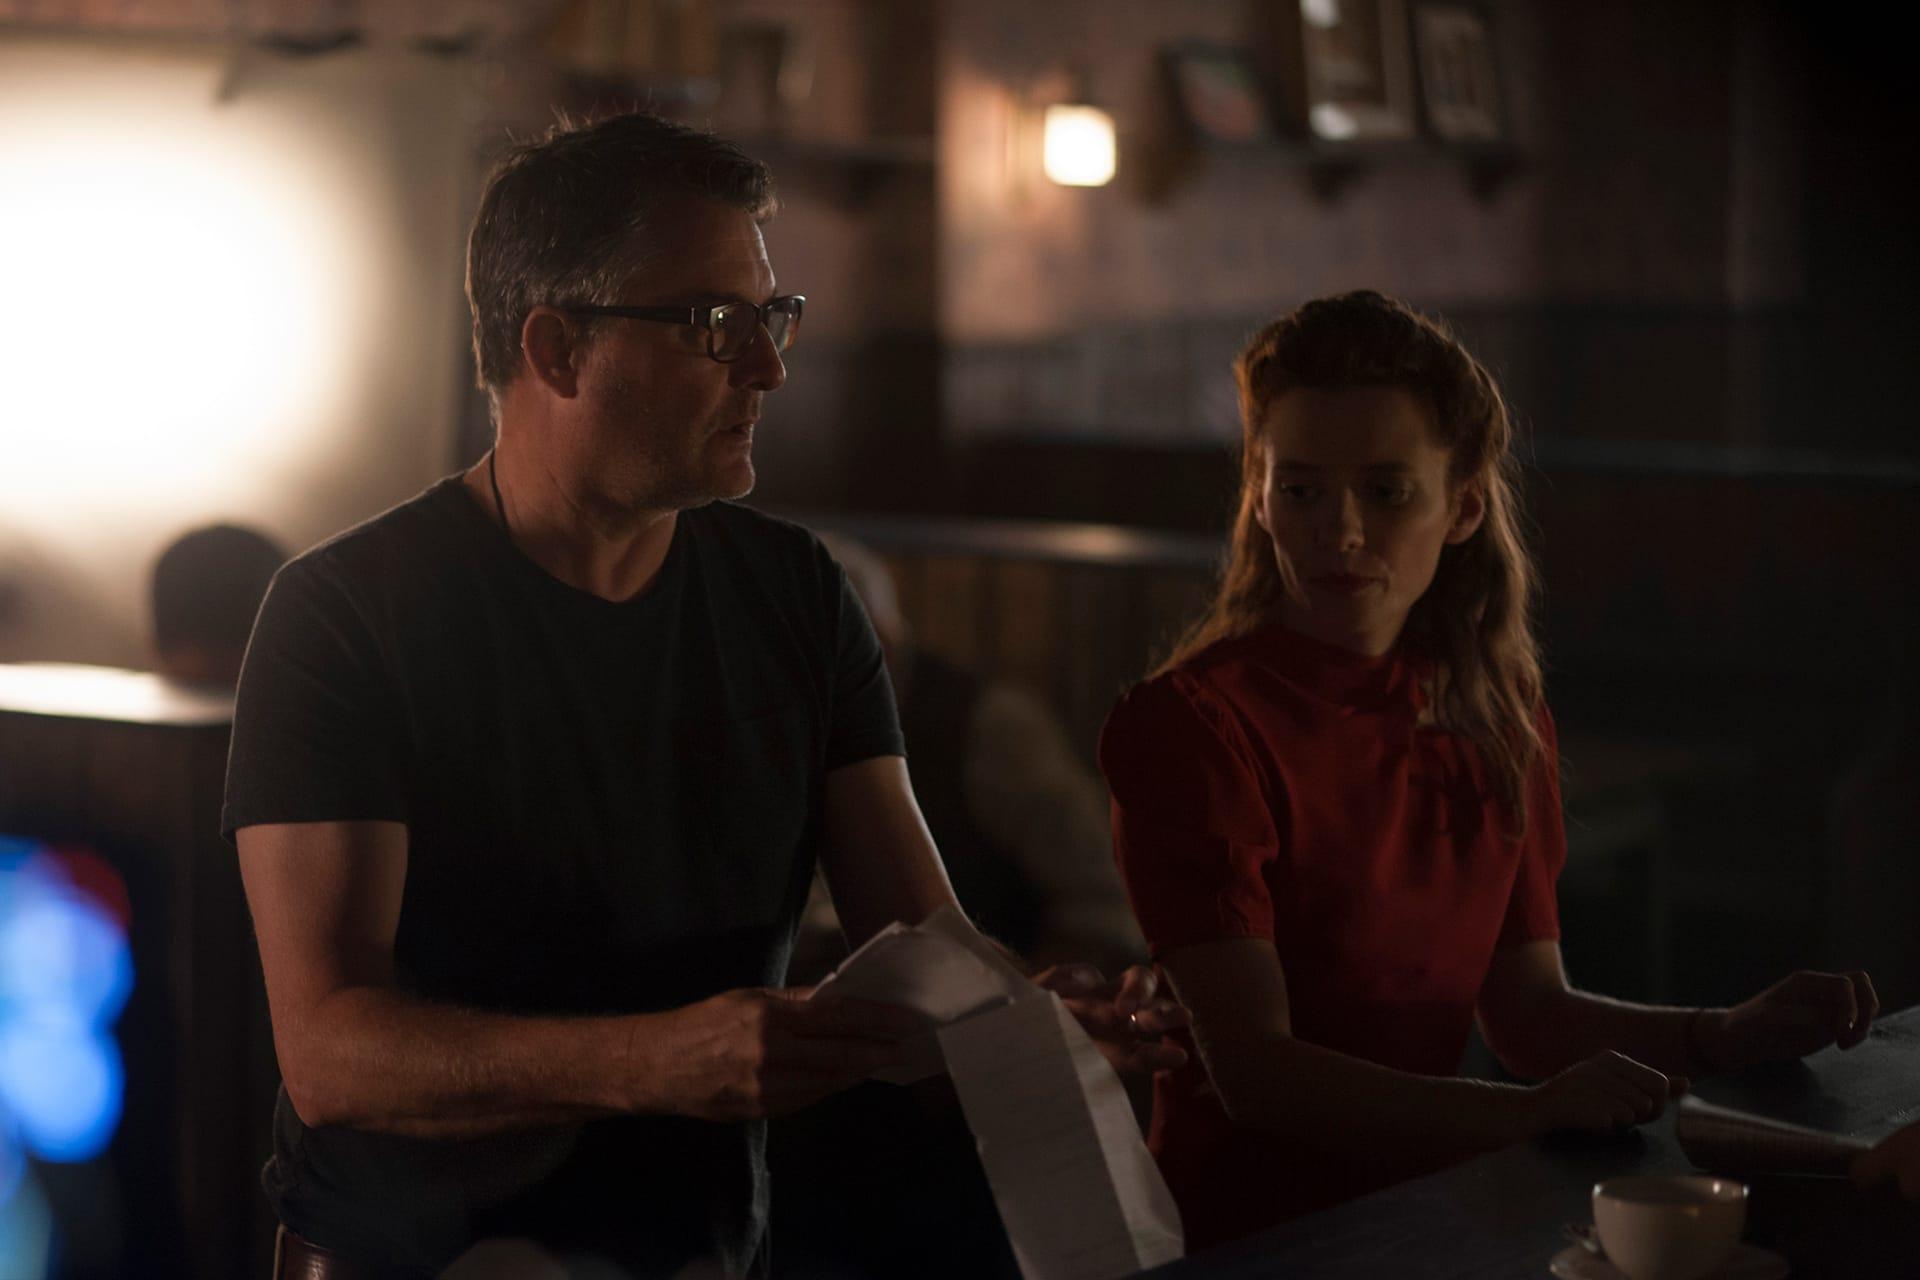 Director Grant Harvey with Lara Jean Chorostecki (Krystina) on the set of X Company Season 3.